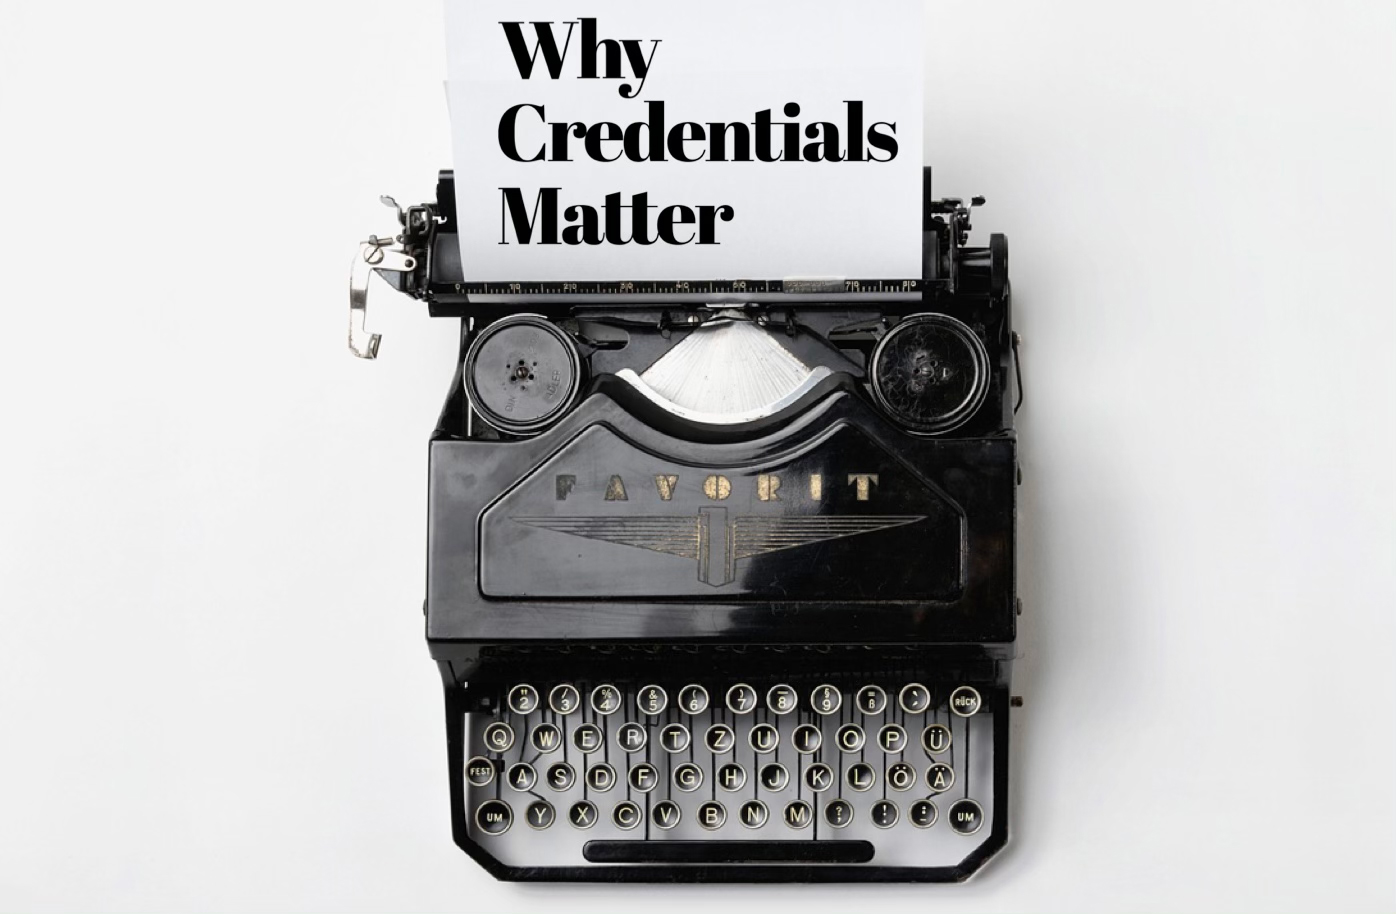 Why Credentials Matter